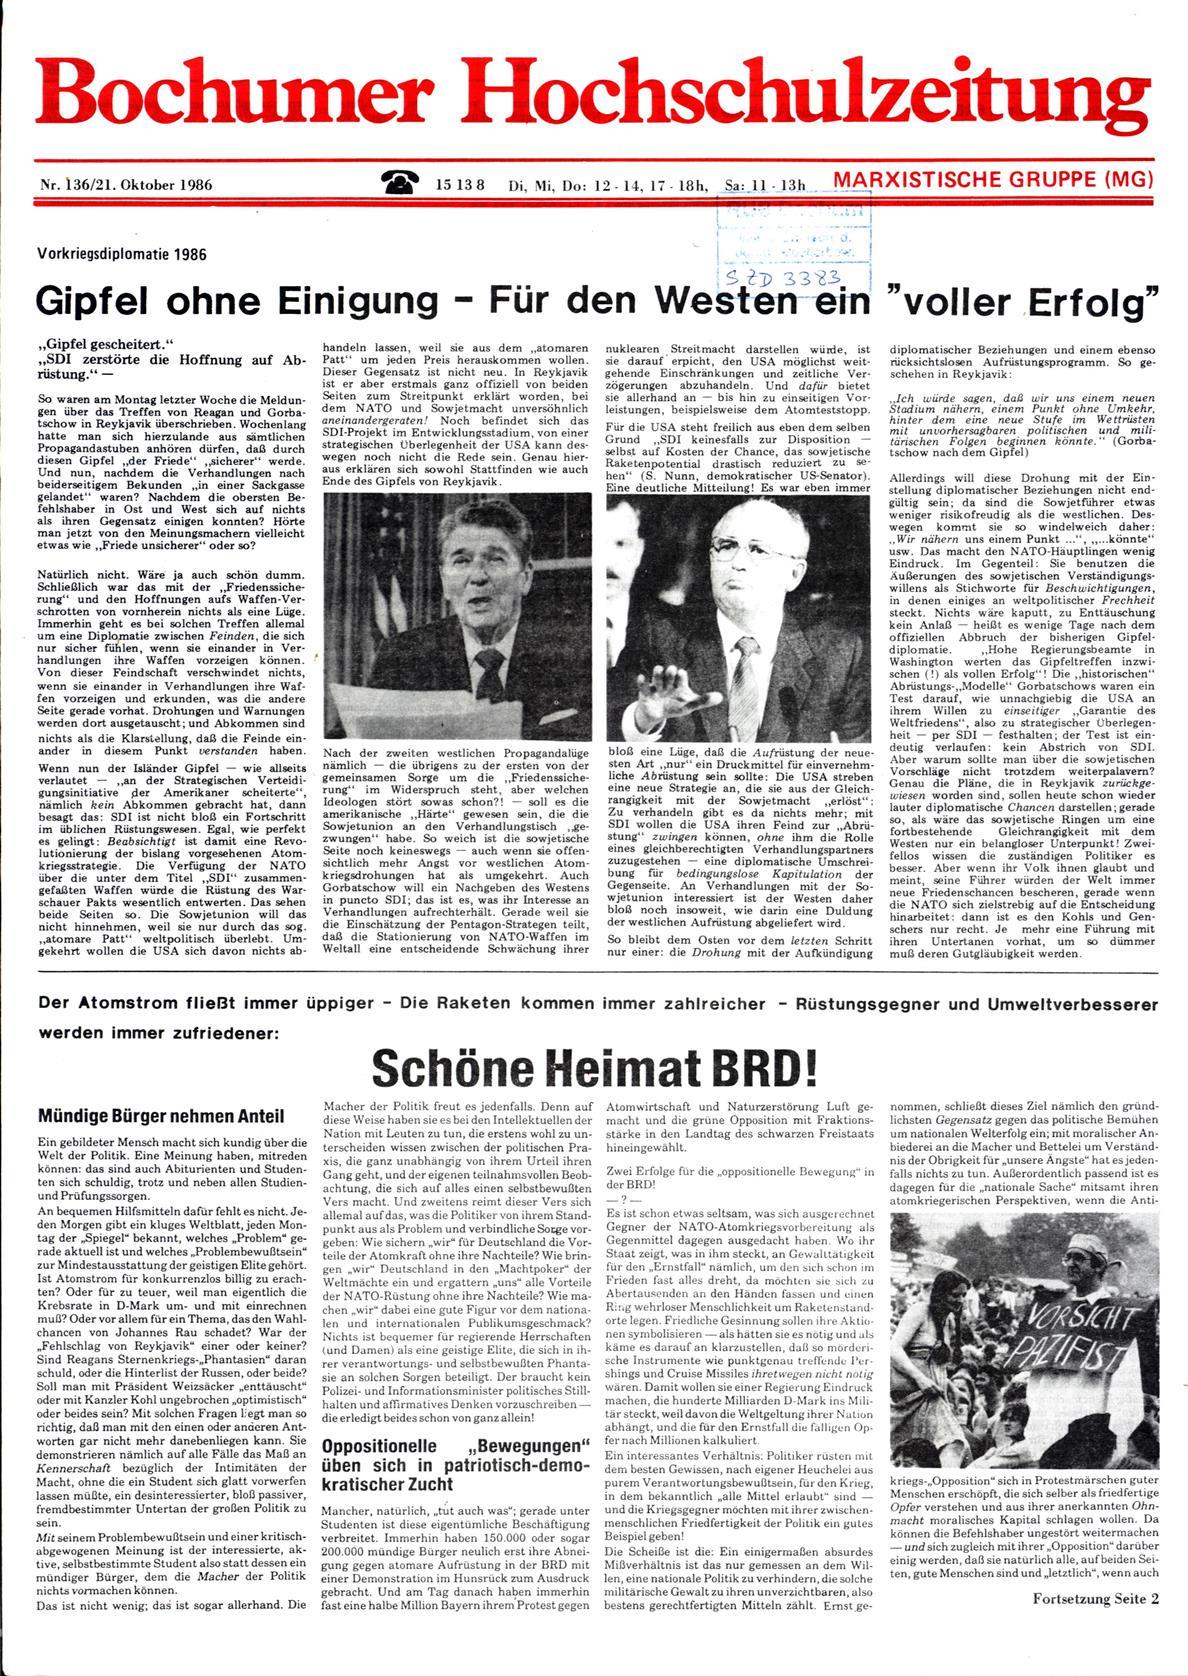 Bochum_BHZ_19861021_136_001